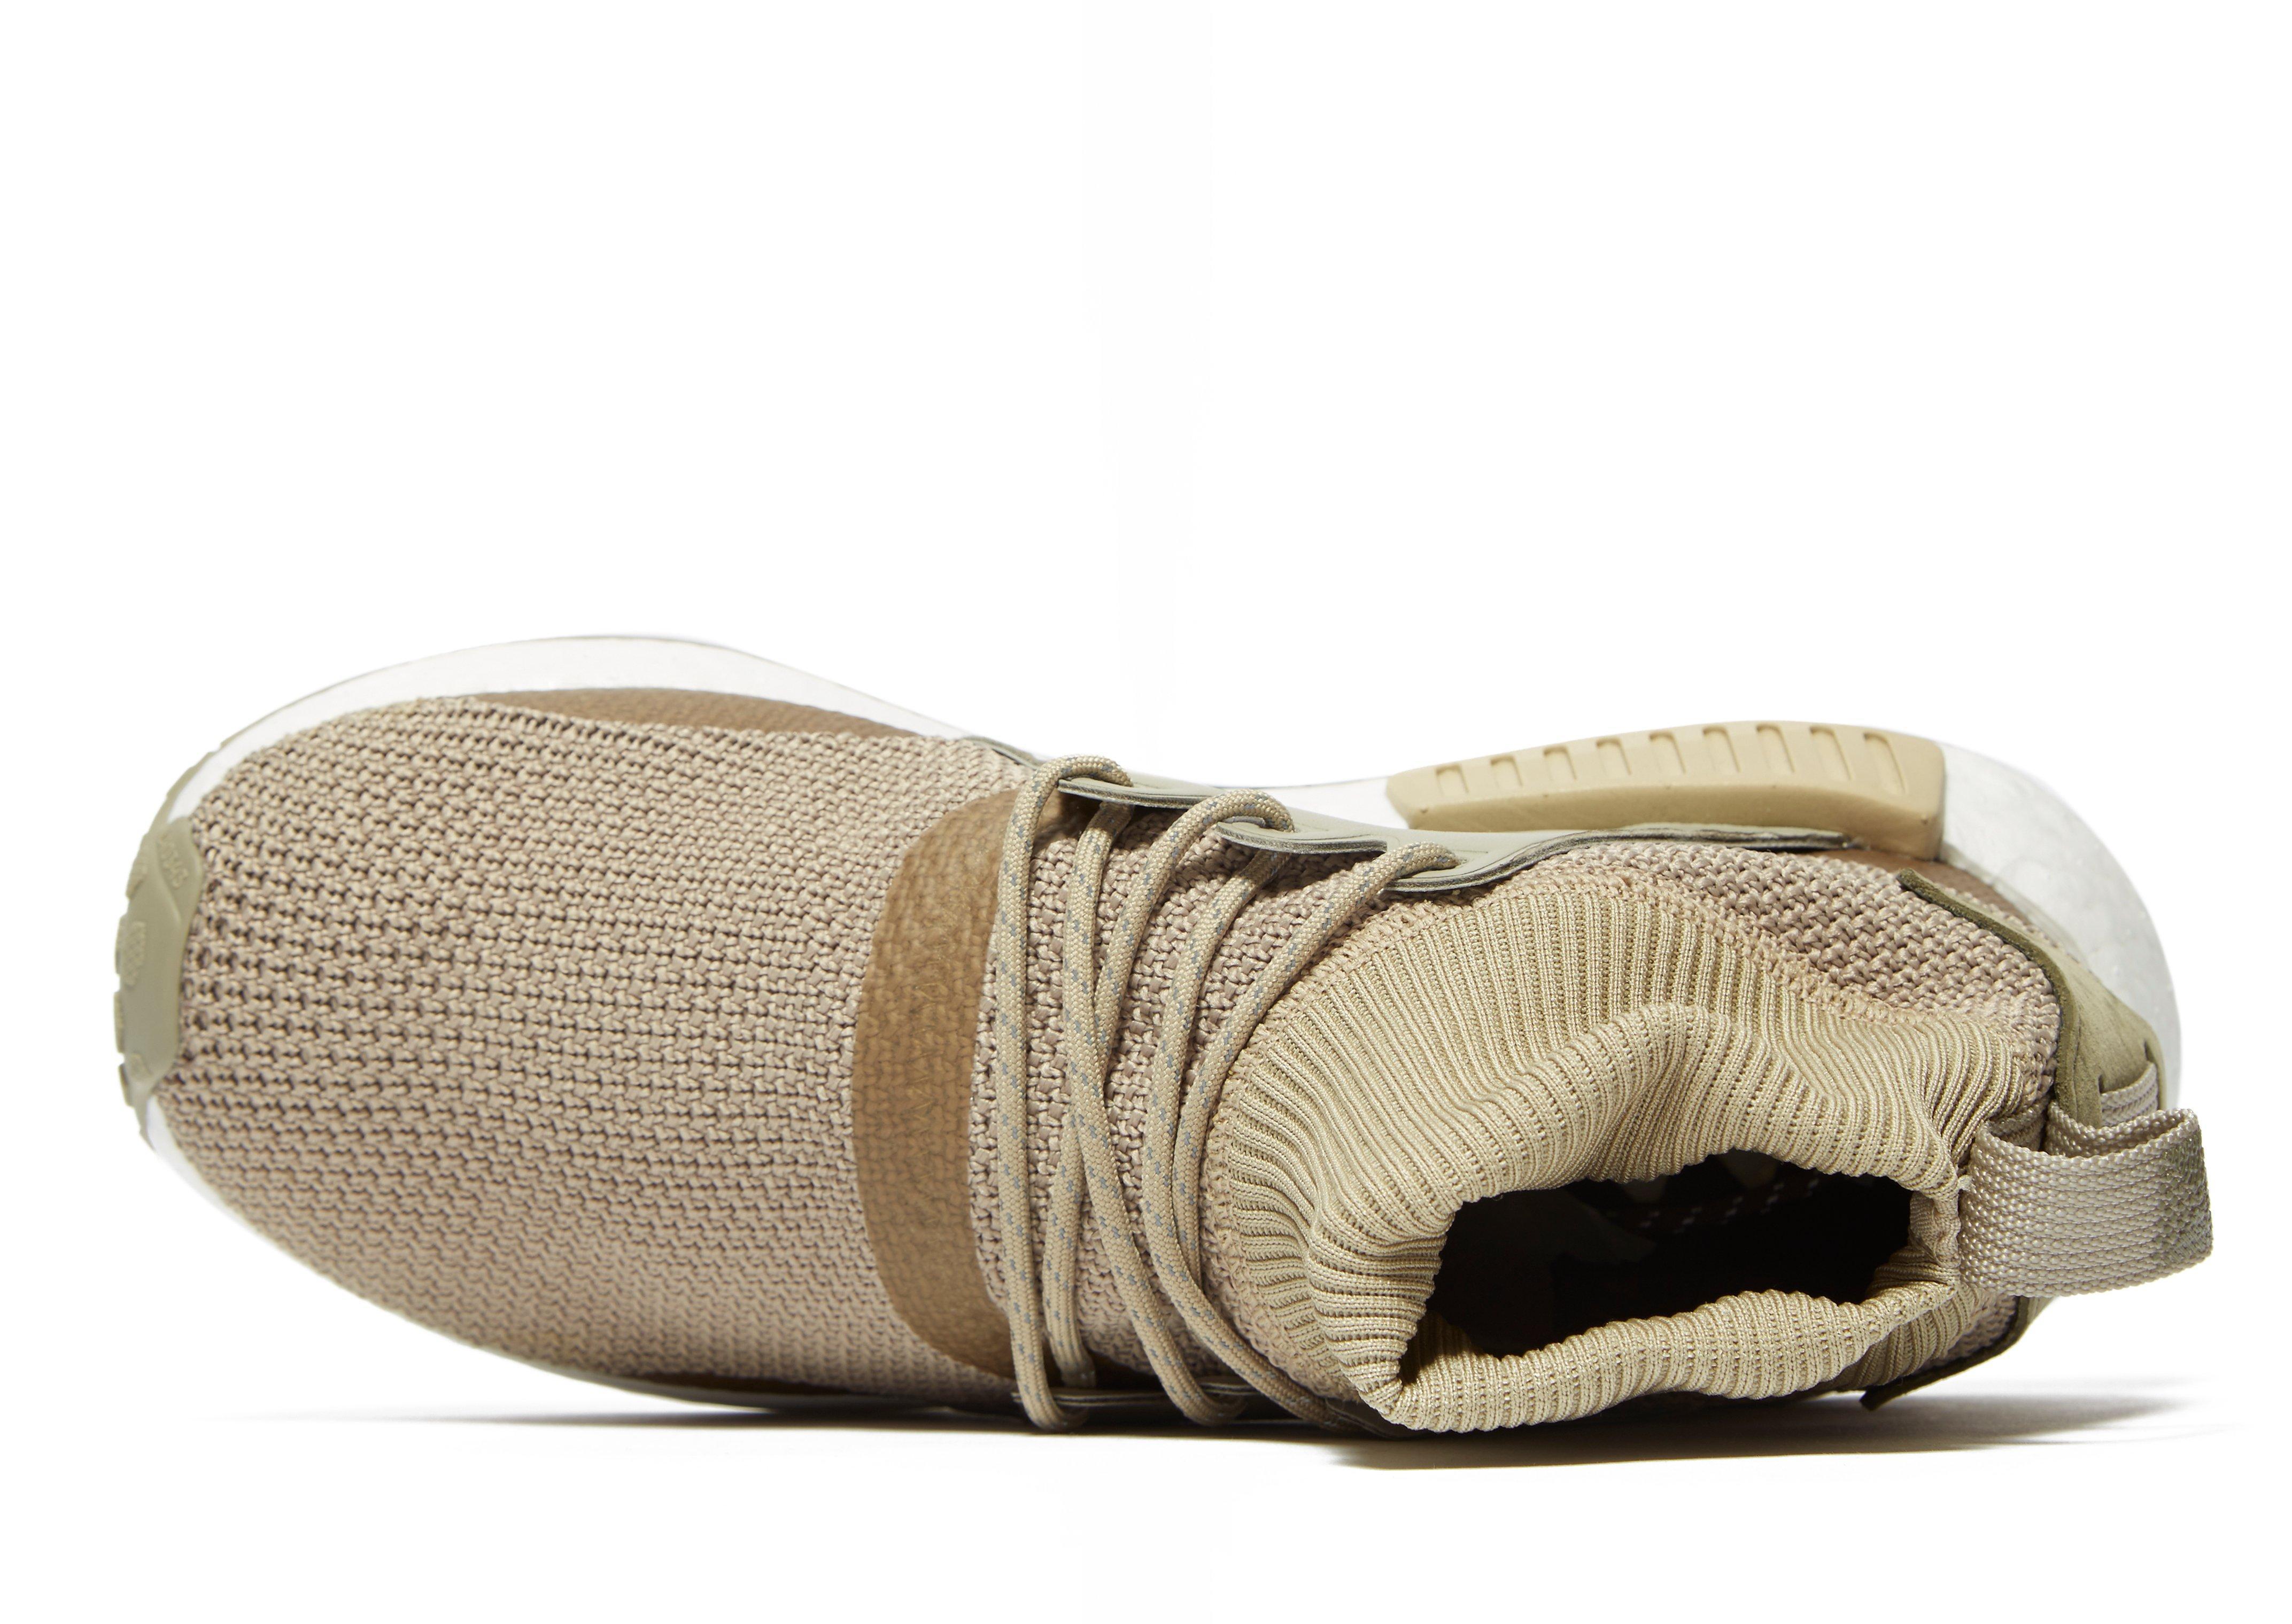 Lyst - adidas Originals Nmd Xr1 Winter in Brown for Men f7c6c402d